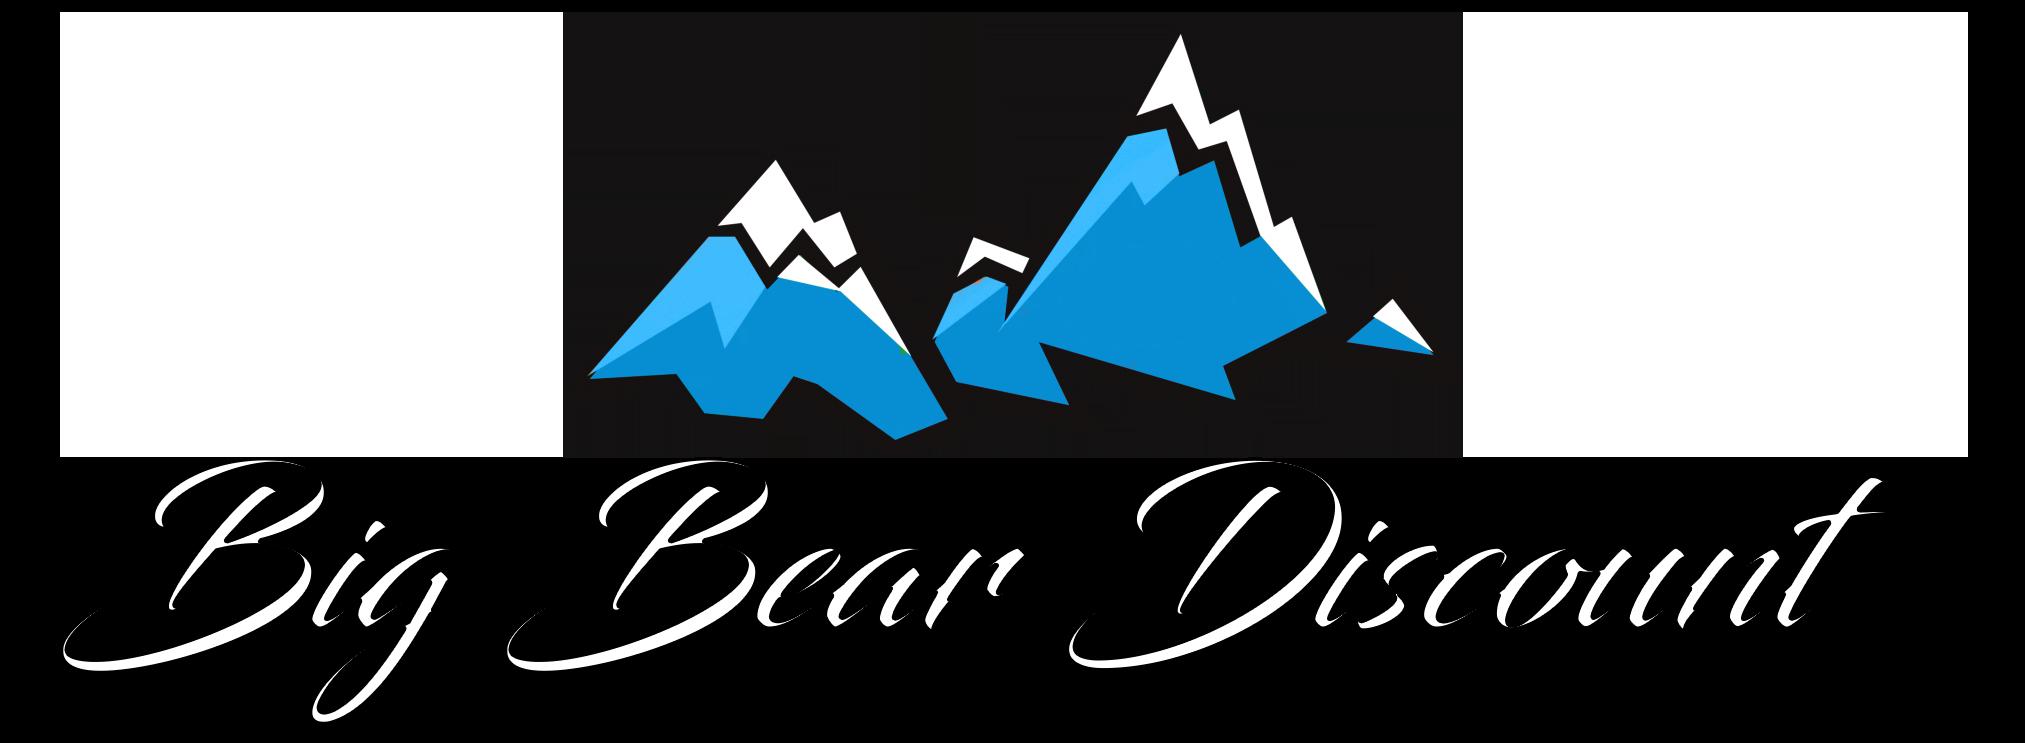 Big Bear Souvenirs | Souvenirs and Gifts Big Bear